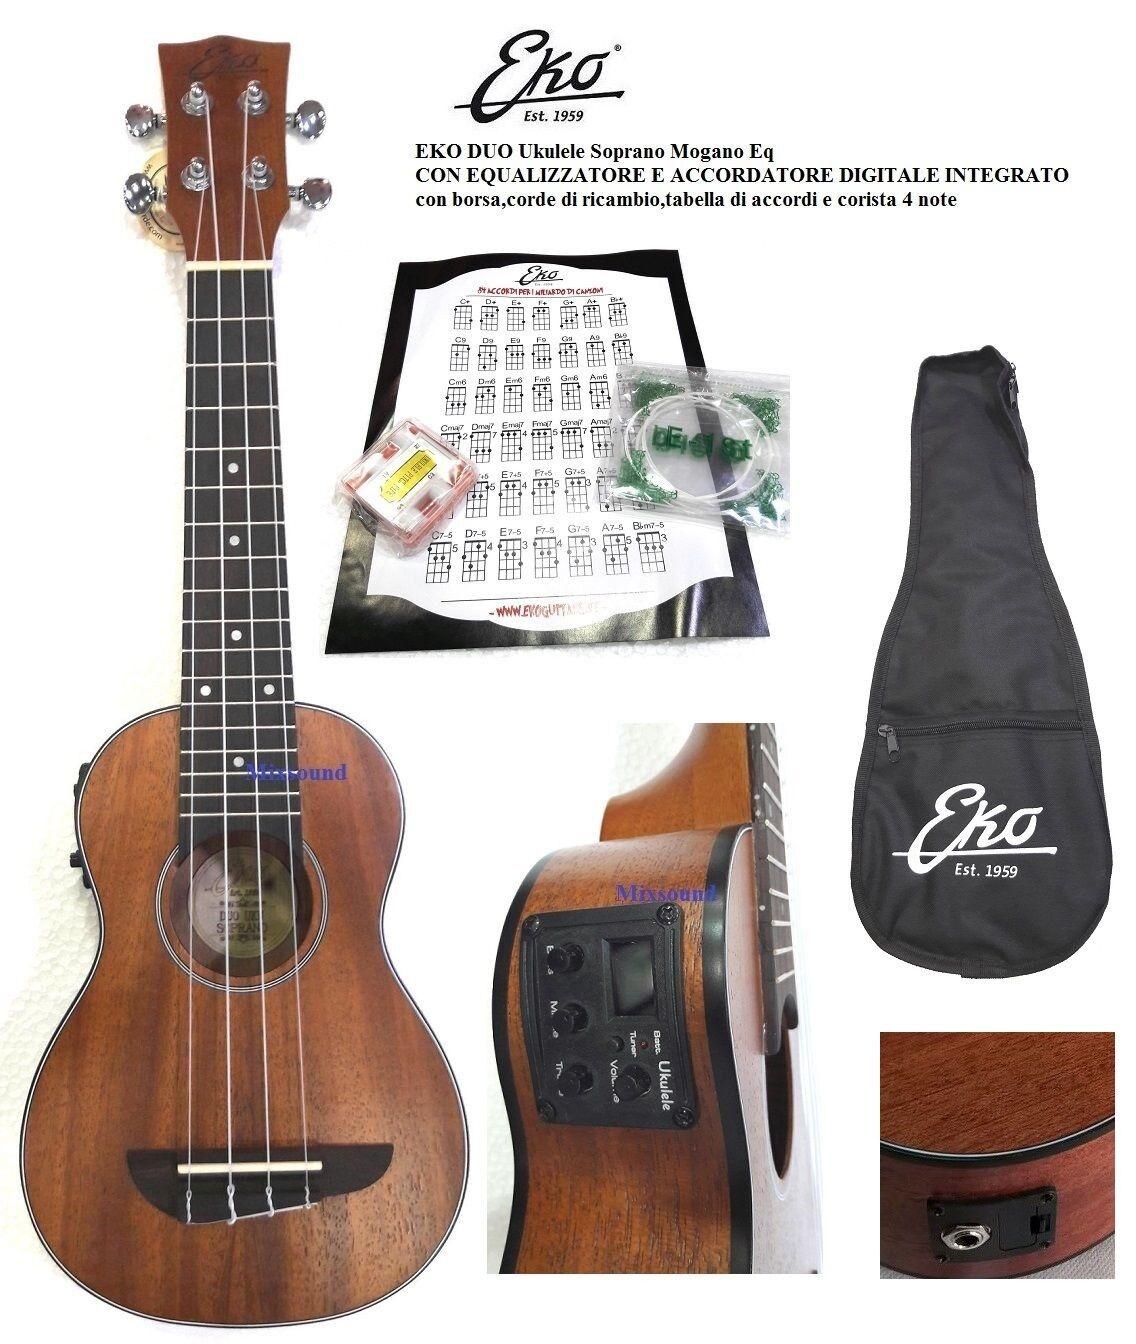 EKO DUO Ukulele Soprano Eq elettrificato c accordatore integrato + borsa + corde